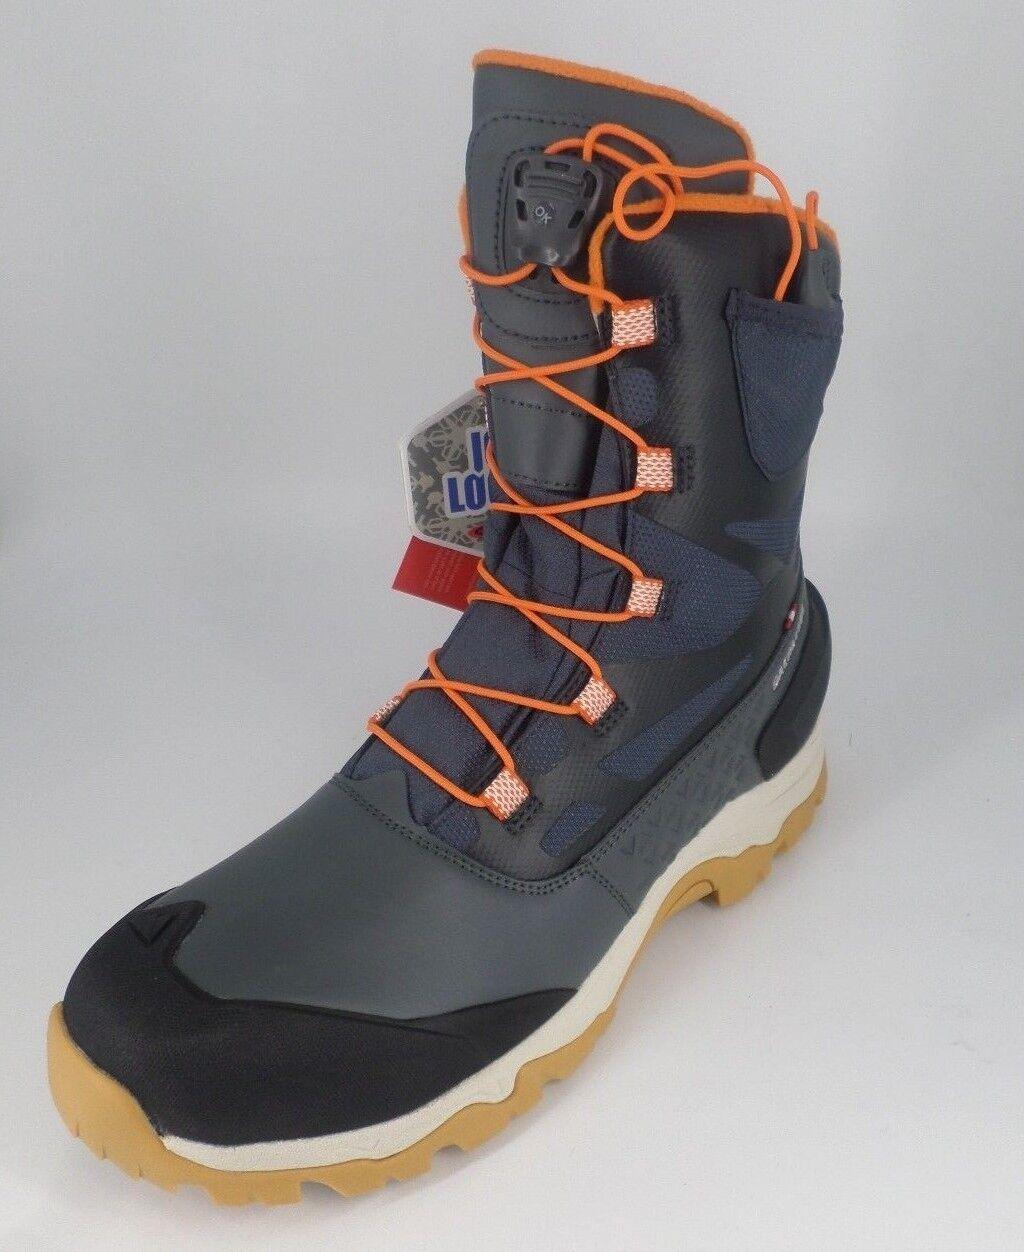 Dachstein botas de invierno de hombre schneespur DDS II gris NH07 28 salew